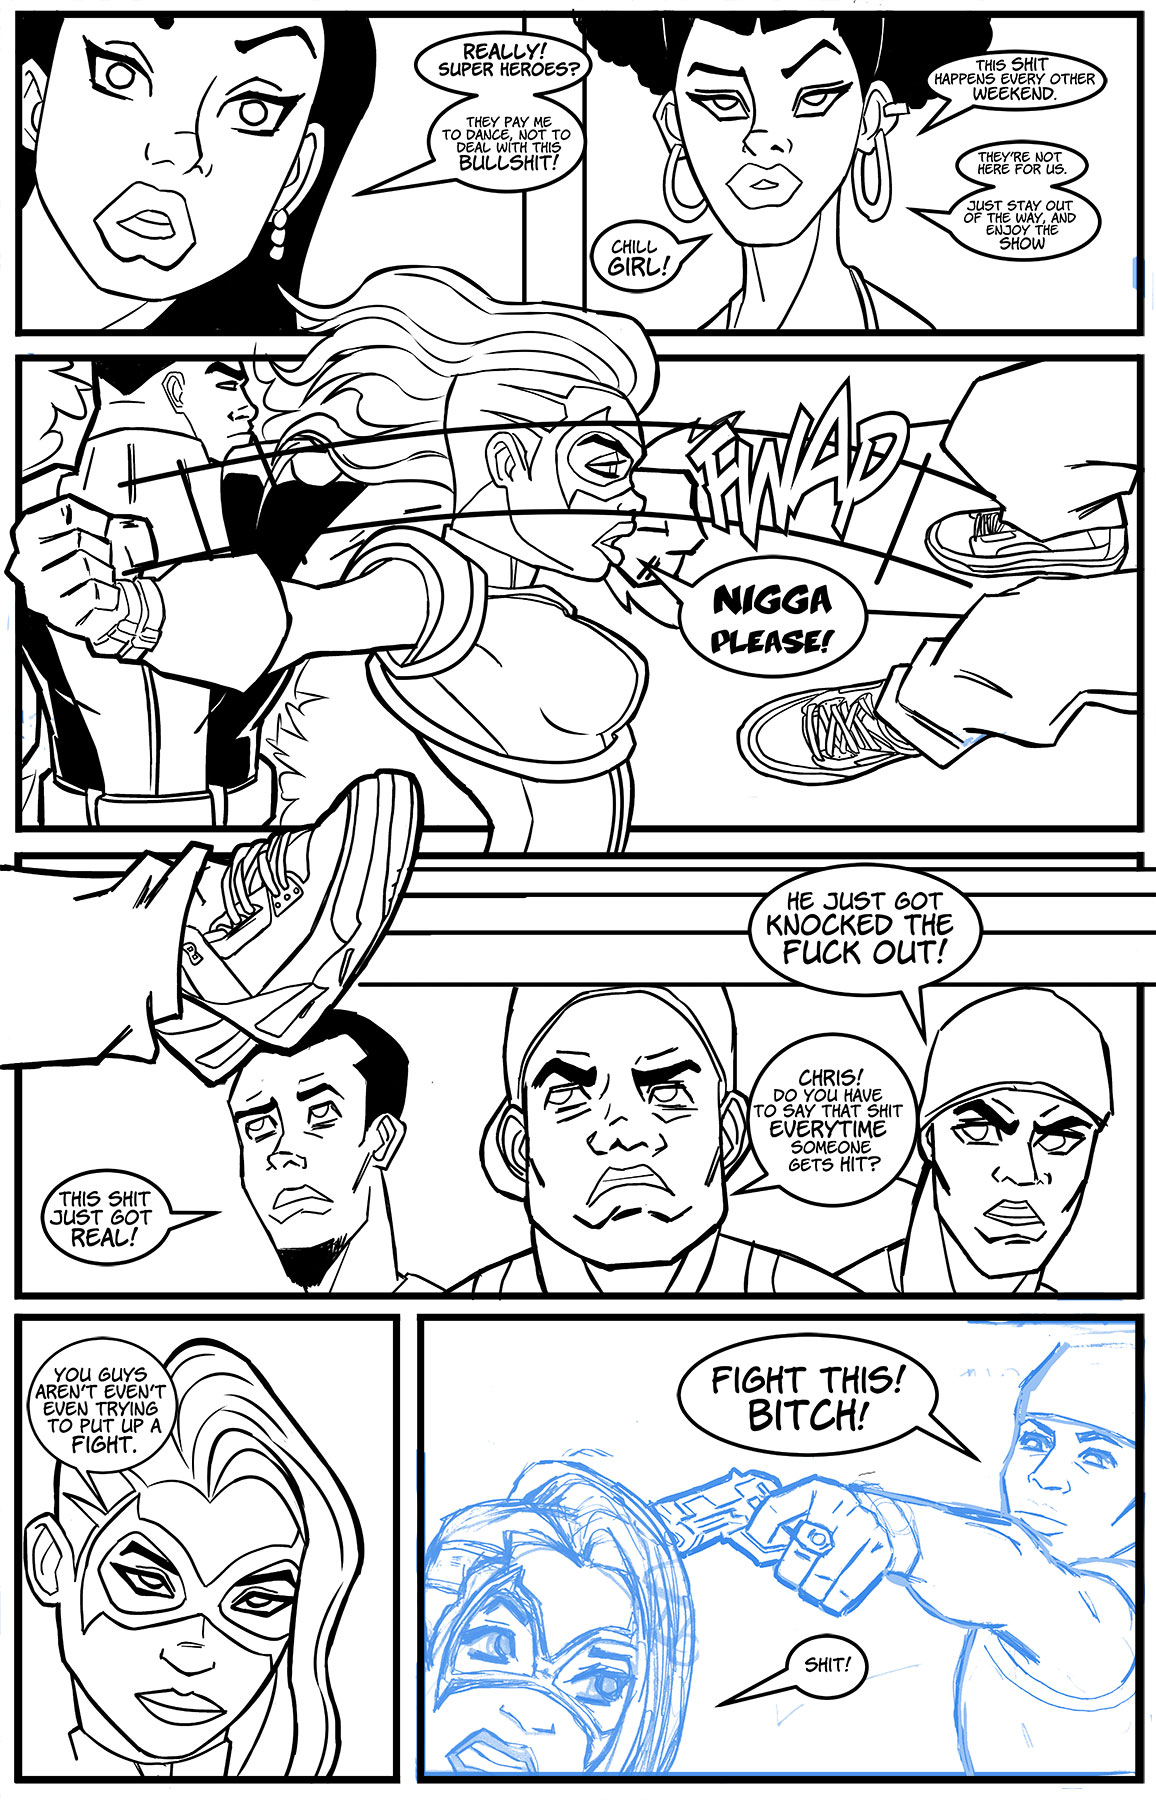 page-9-05-oct-2015-no-blue